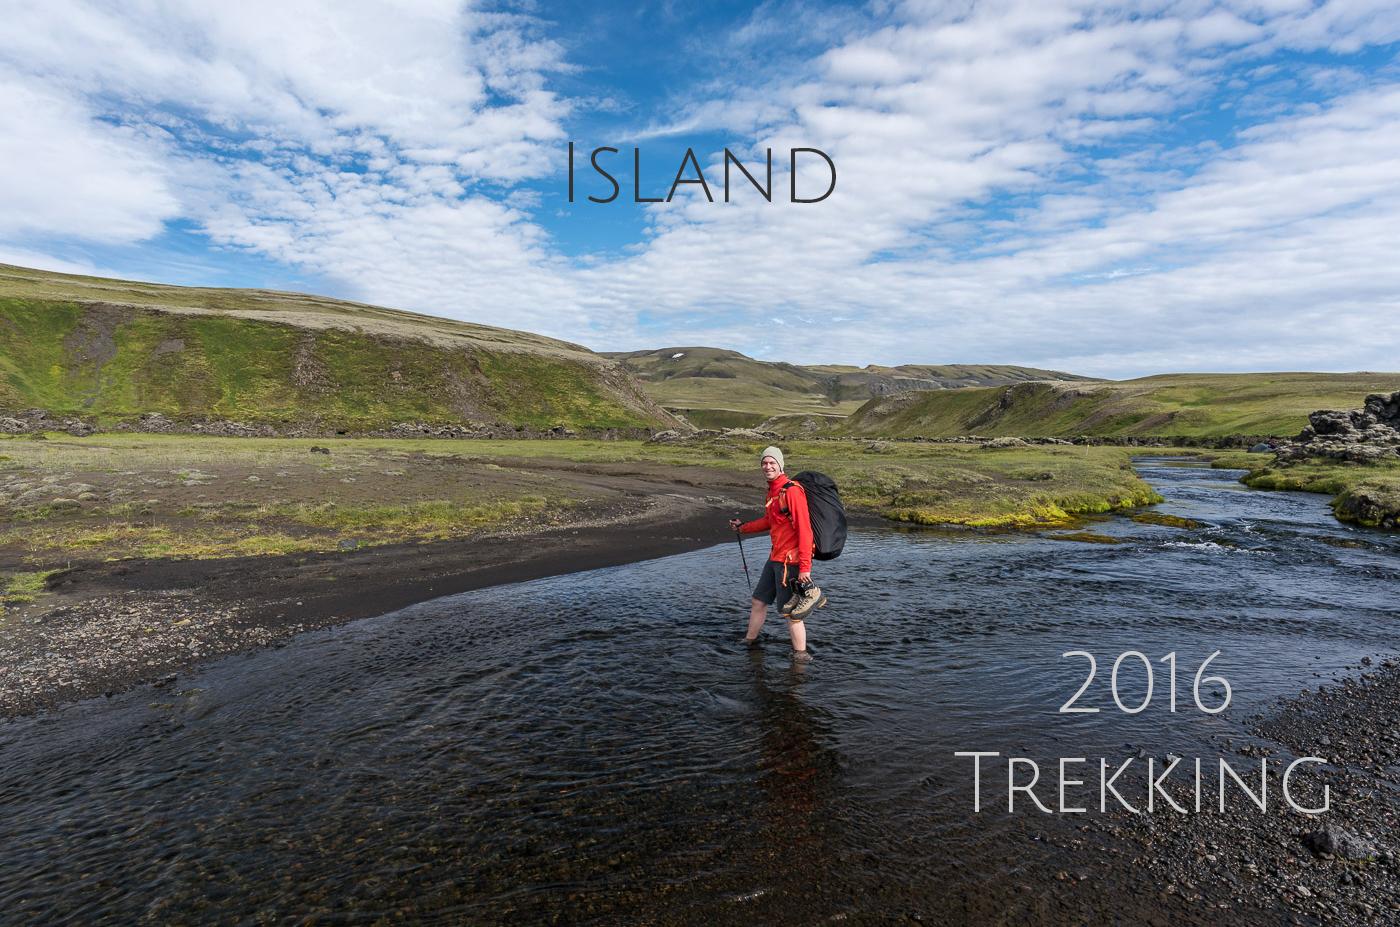 Island Trekking 2016